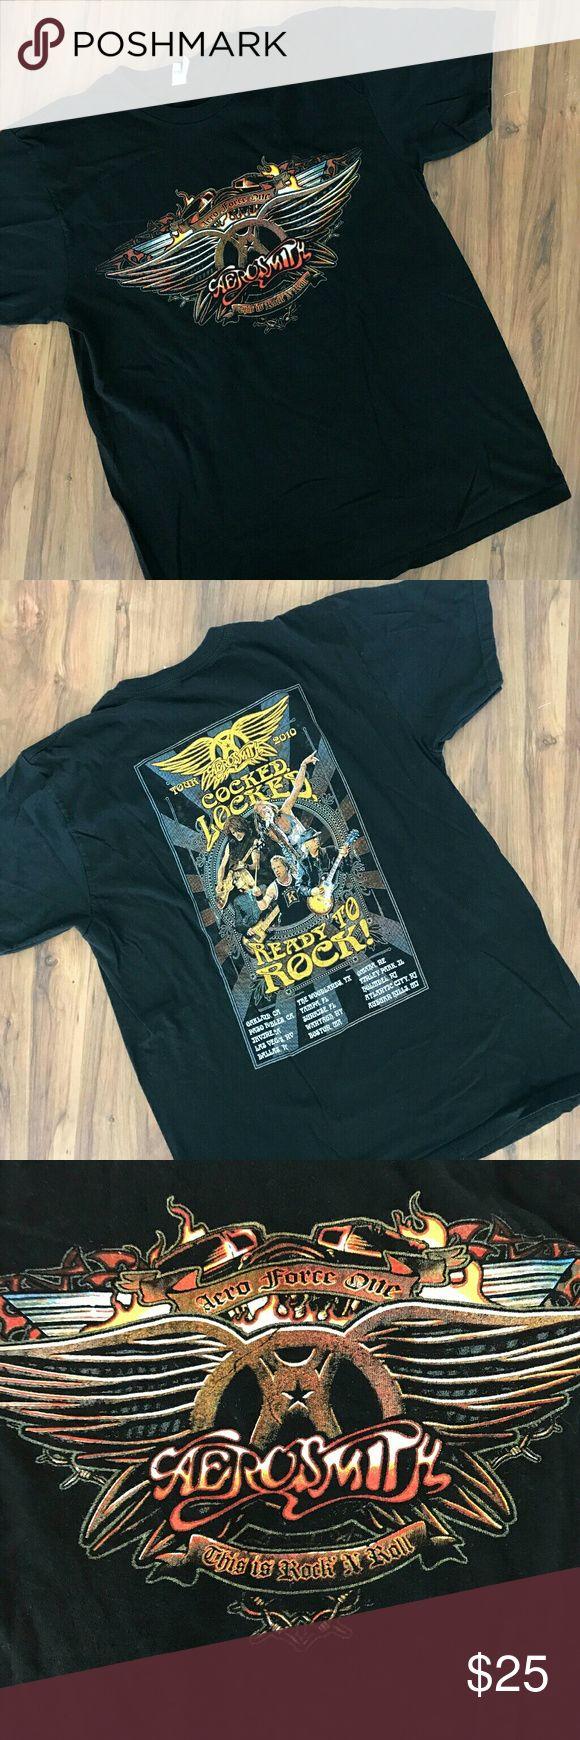 Aerosmith Tour 2010 Concert T shirt Adult Size Sz Color         : Black Style          : T shirt Size           : Adult Medium Brand        : None  Inventory  : A94 B1 Alstyle Shirts Tees - Short Sleeve